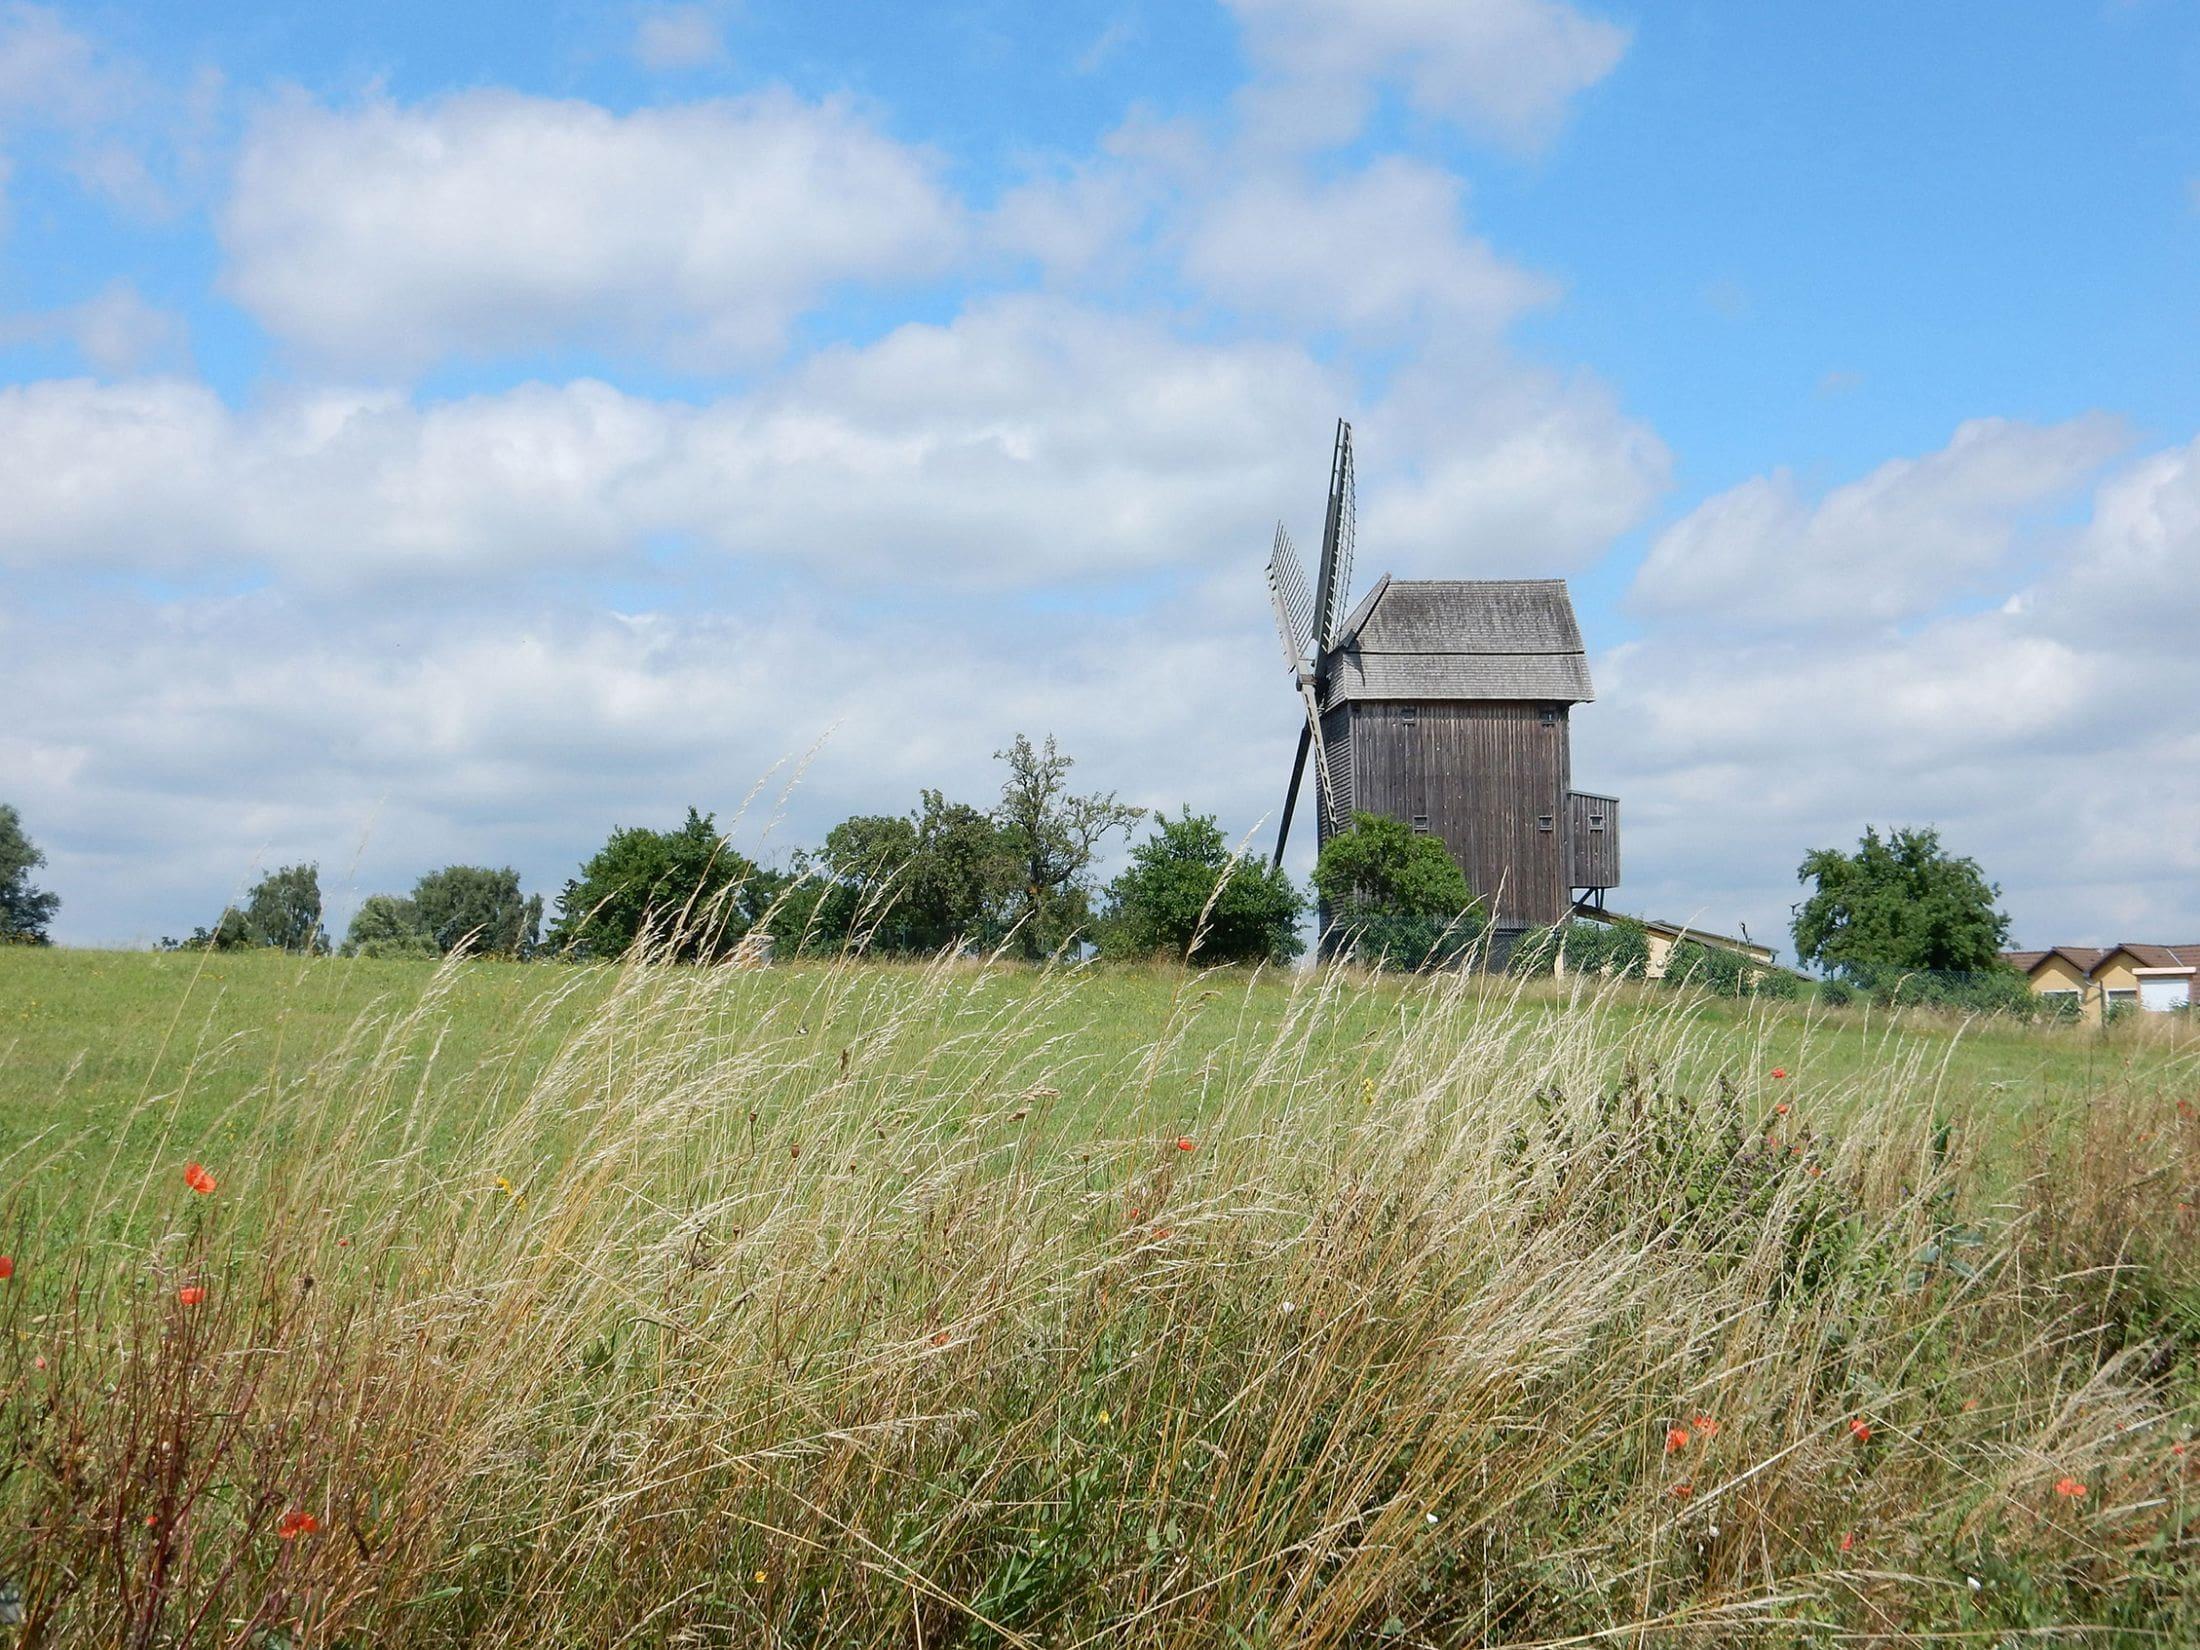 Mühle in Vehlefanz